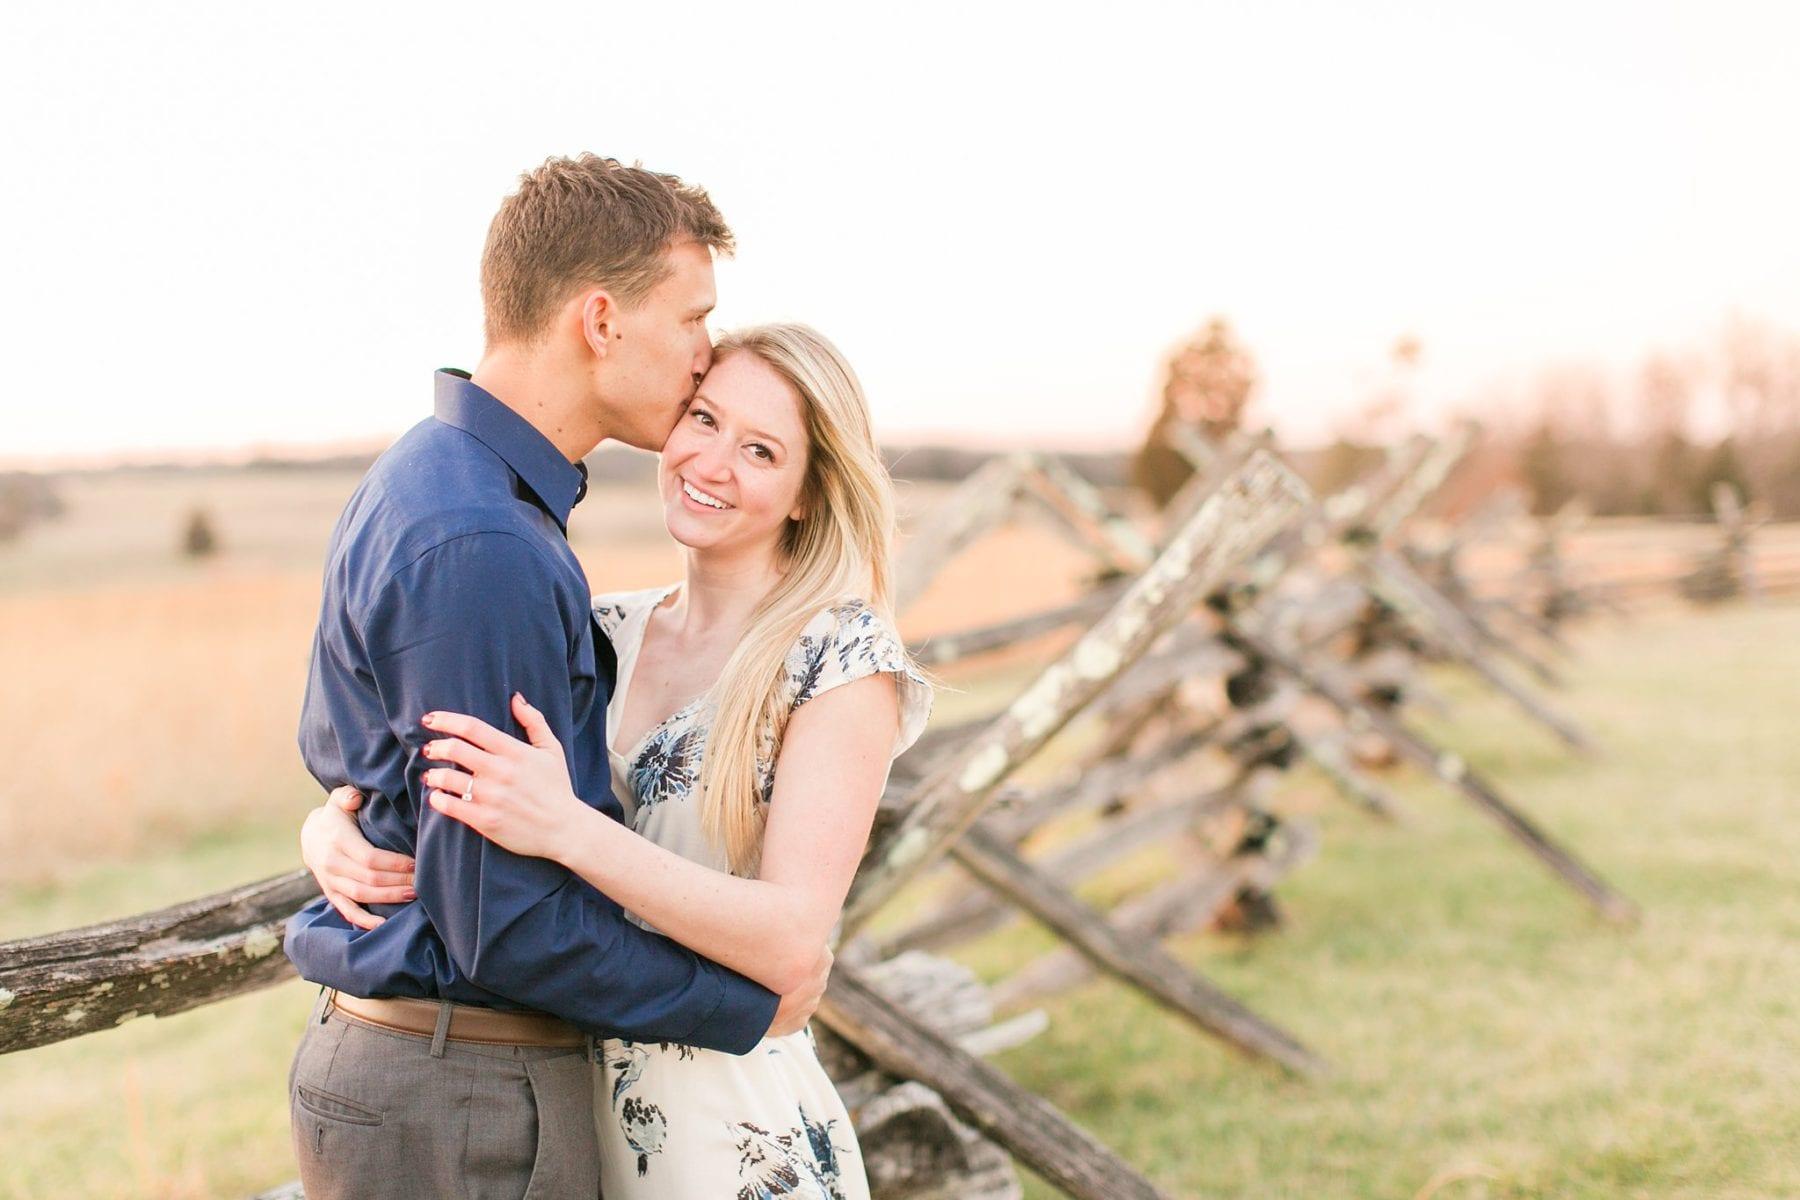 Manassas Battlefield Engagement Session Virginia Wedding Photographer Danielle & Charlie Megan Kelsey Photography-6362.jpg